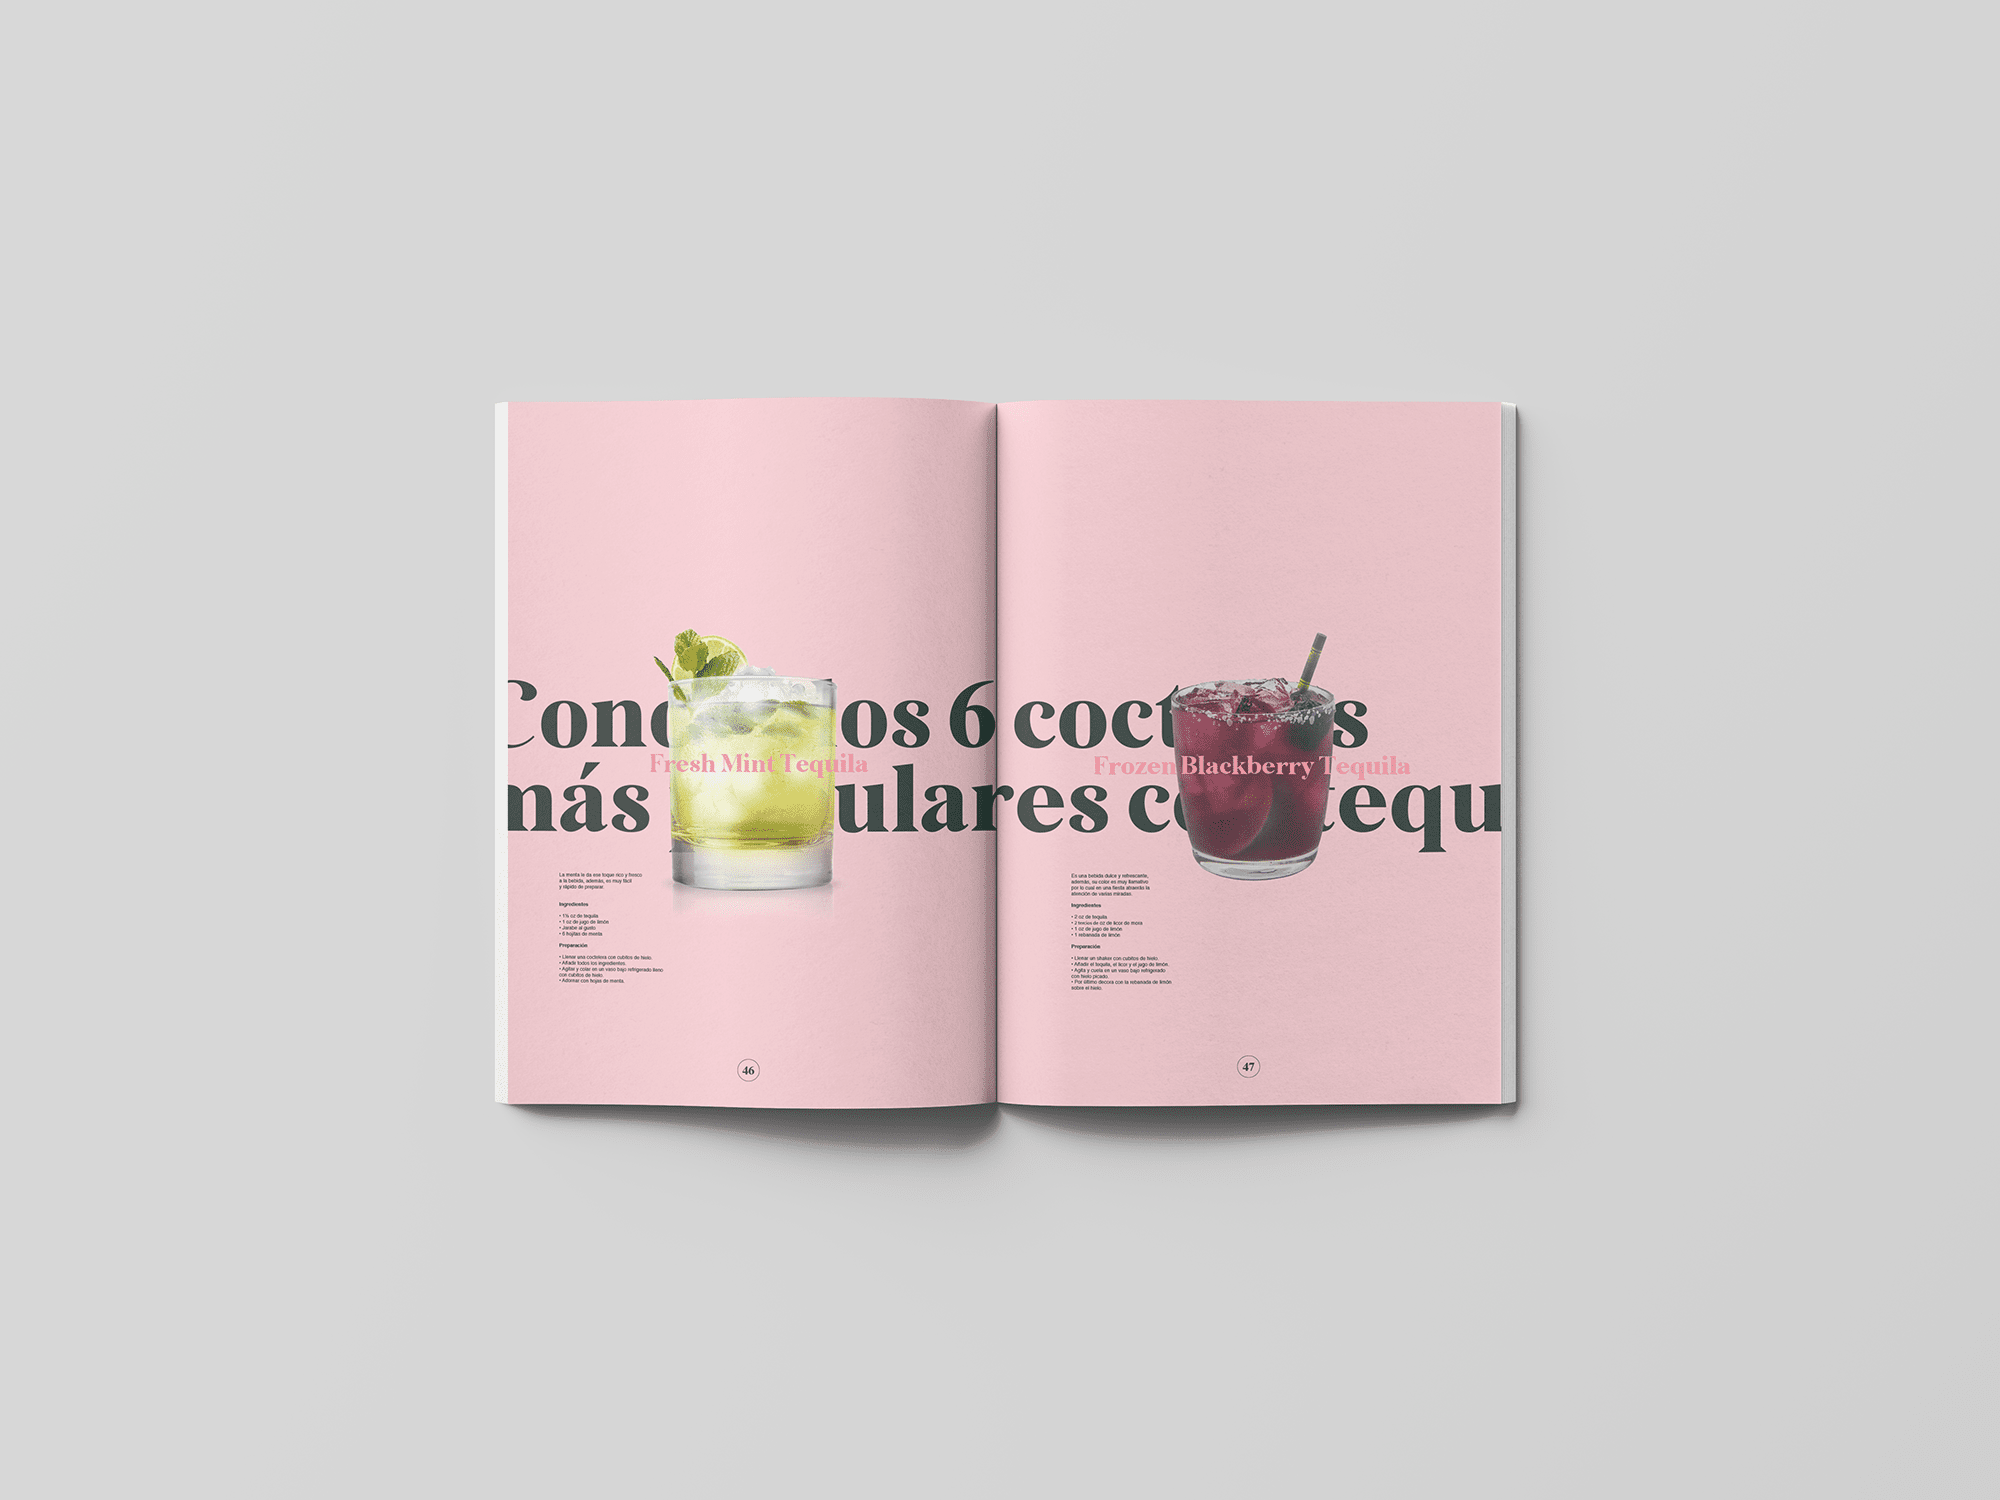 spread-19-book-agave-yoenpaperland